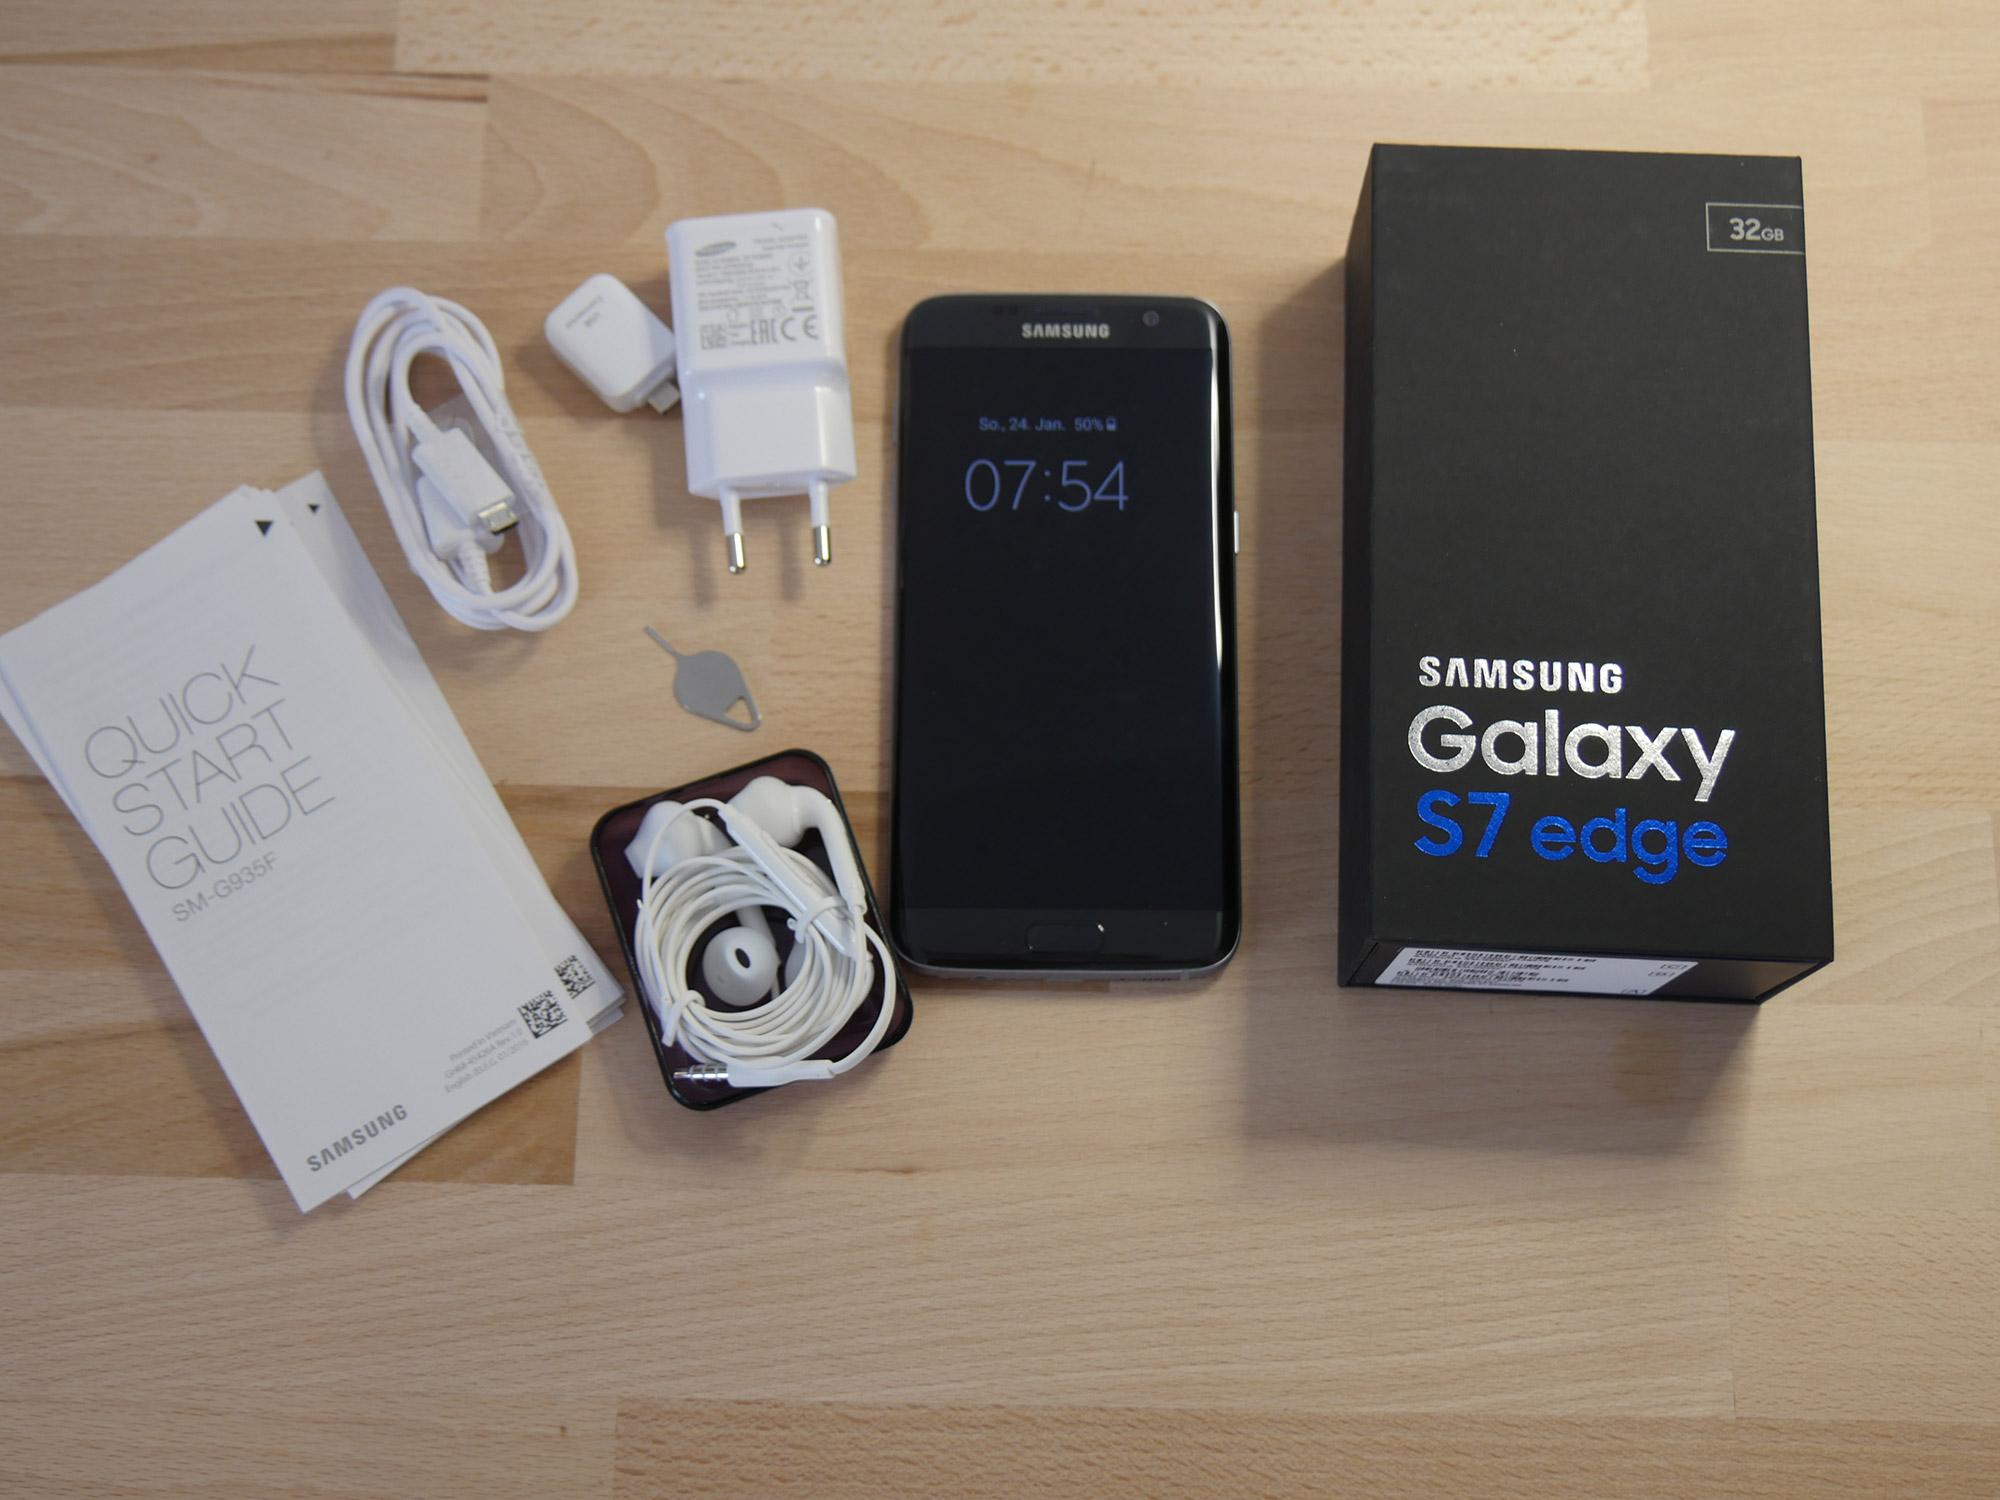 Samsung Galaxy Euro Telekommunikation Handy sonstige